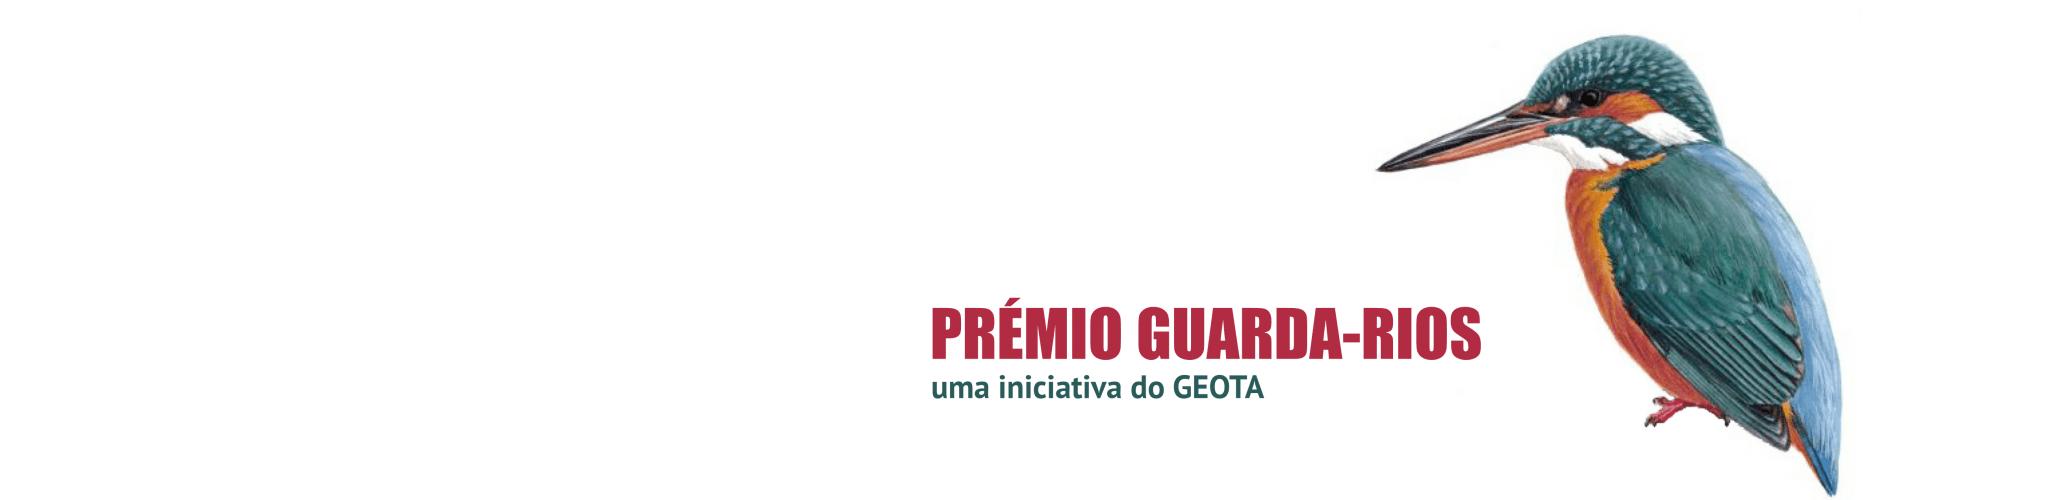 Prémio Guarda-Rios